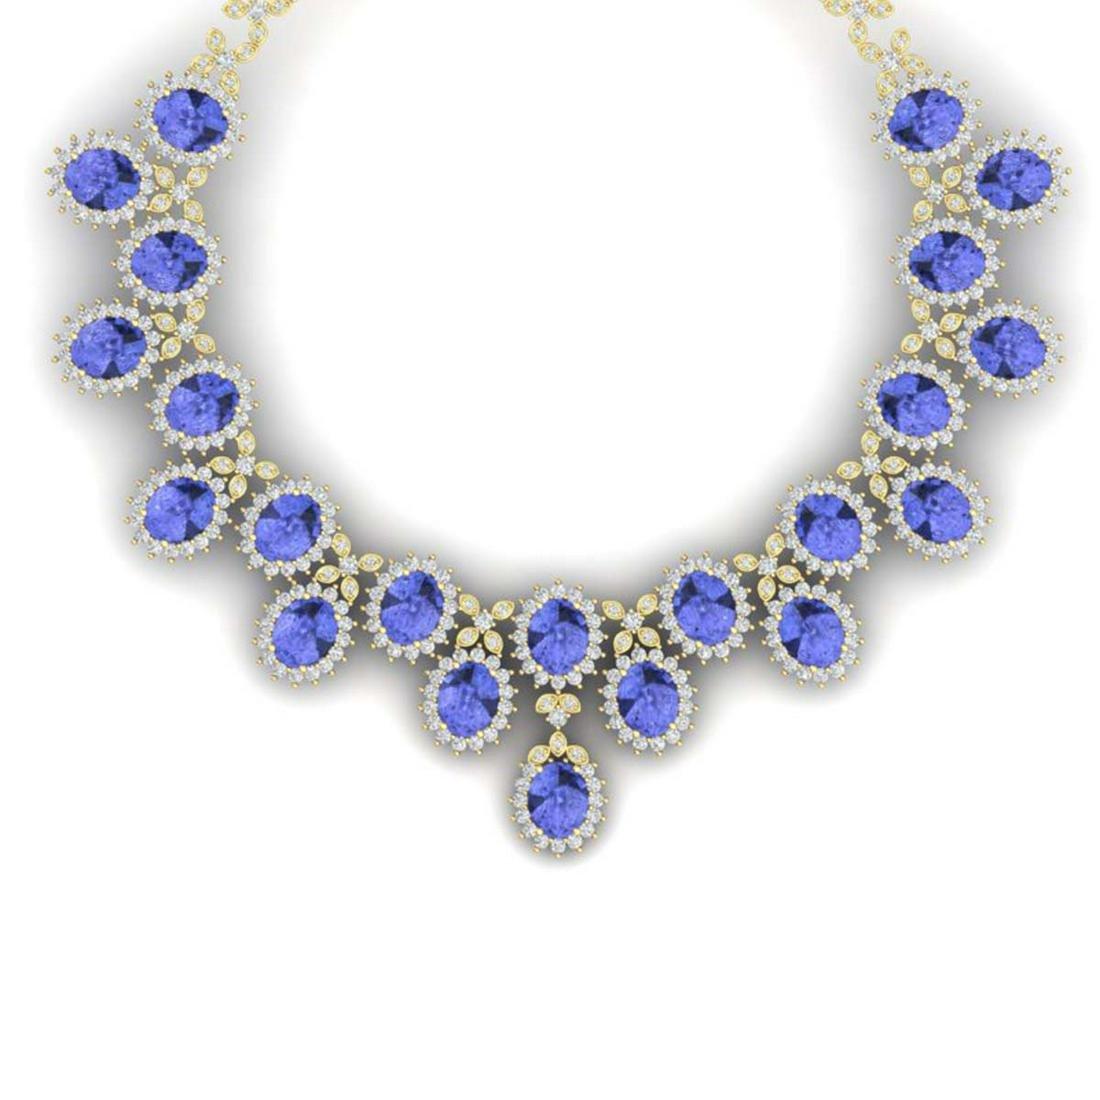 86 ctw Tanzanite & VS Diamond Necklace 18K Yellow Gold